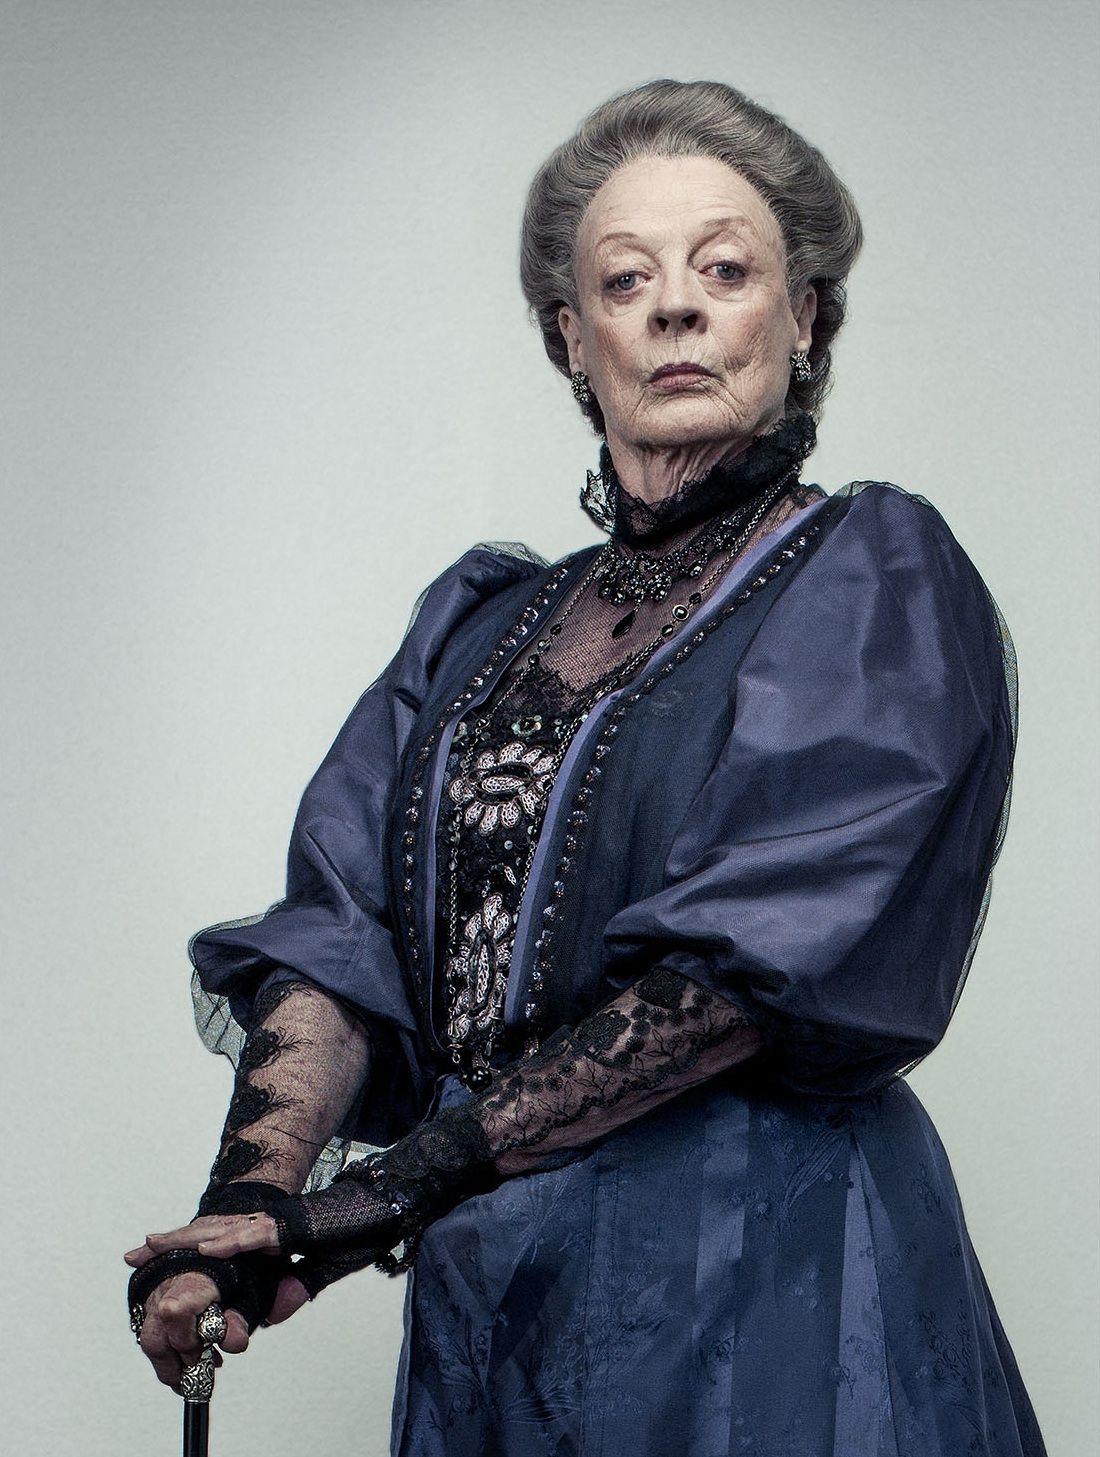 Violet Crawley szigorúan, de nagyon csinosan